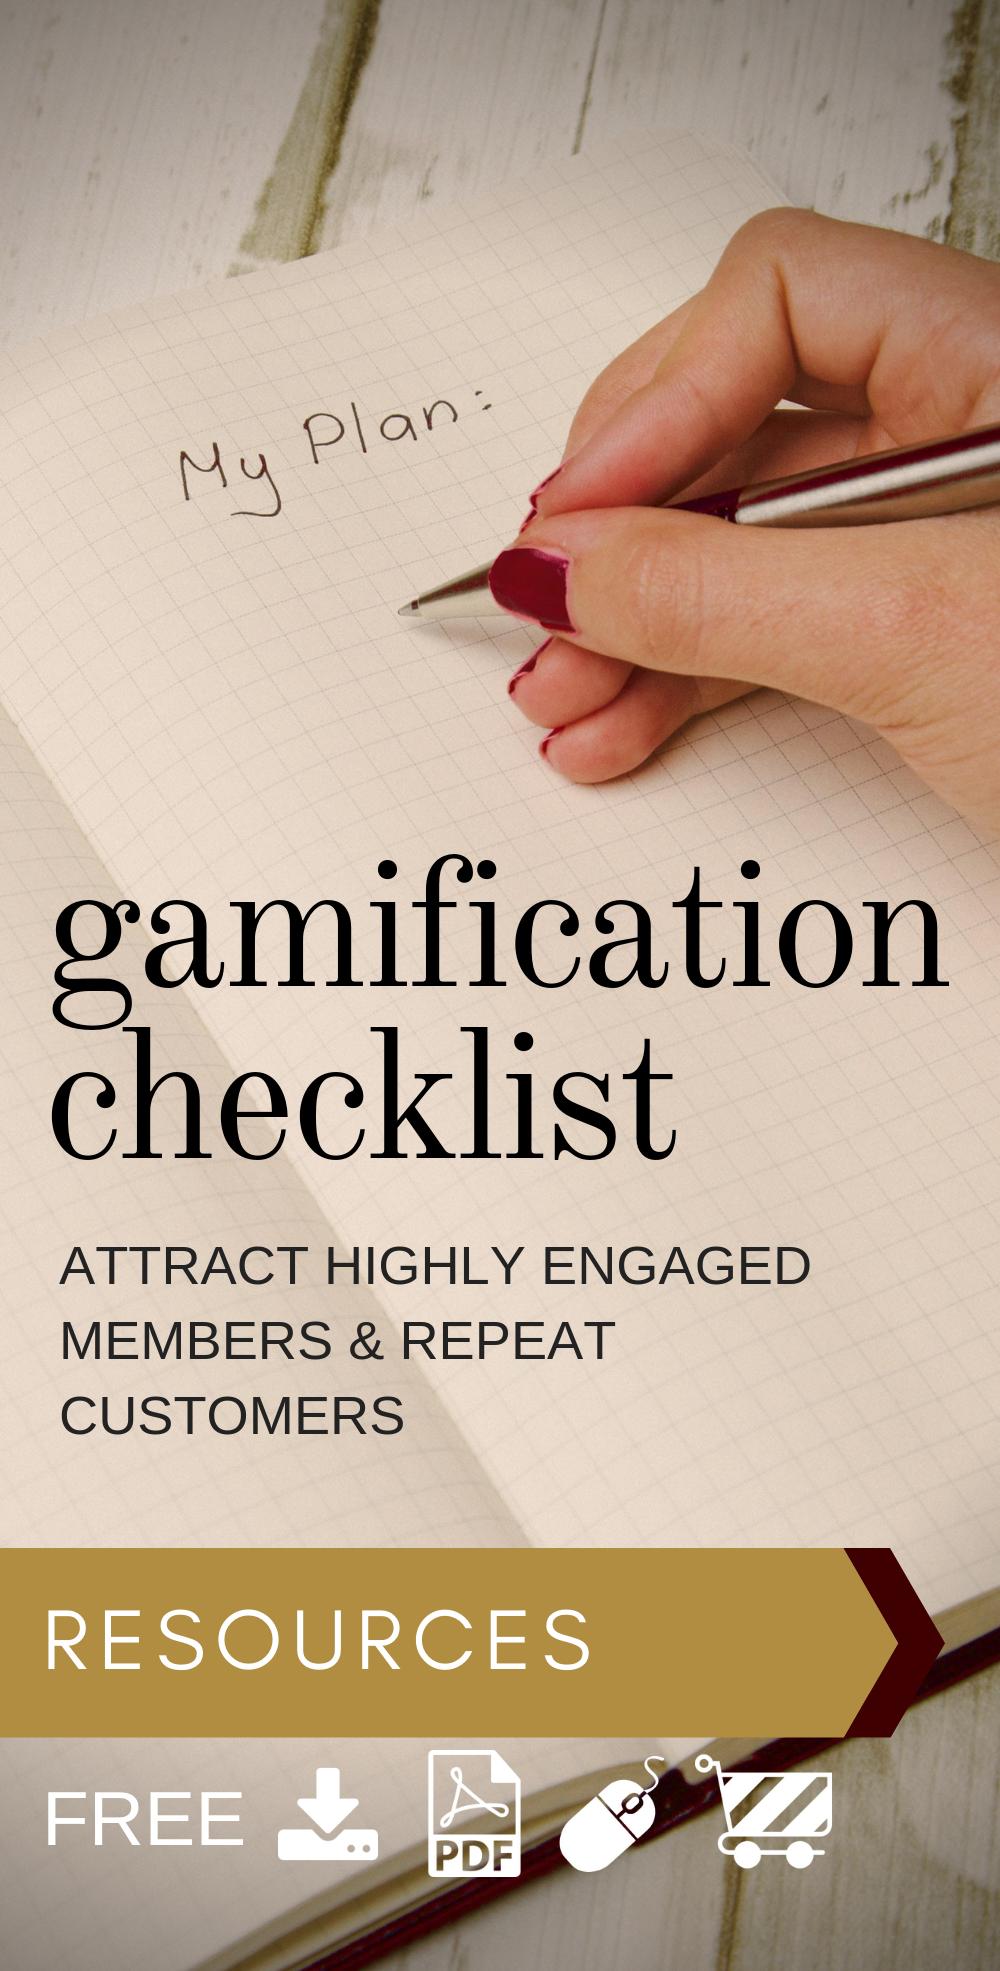 GamificationChecklist